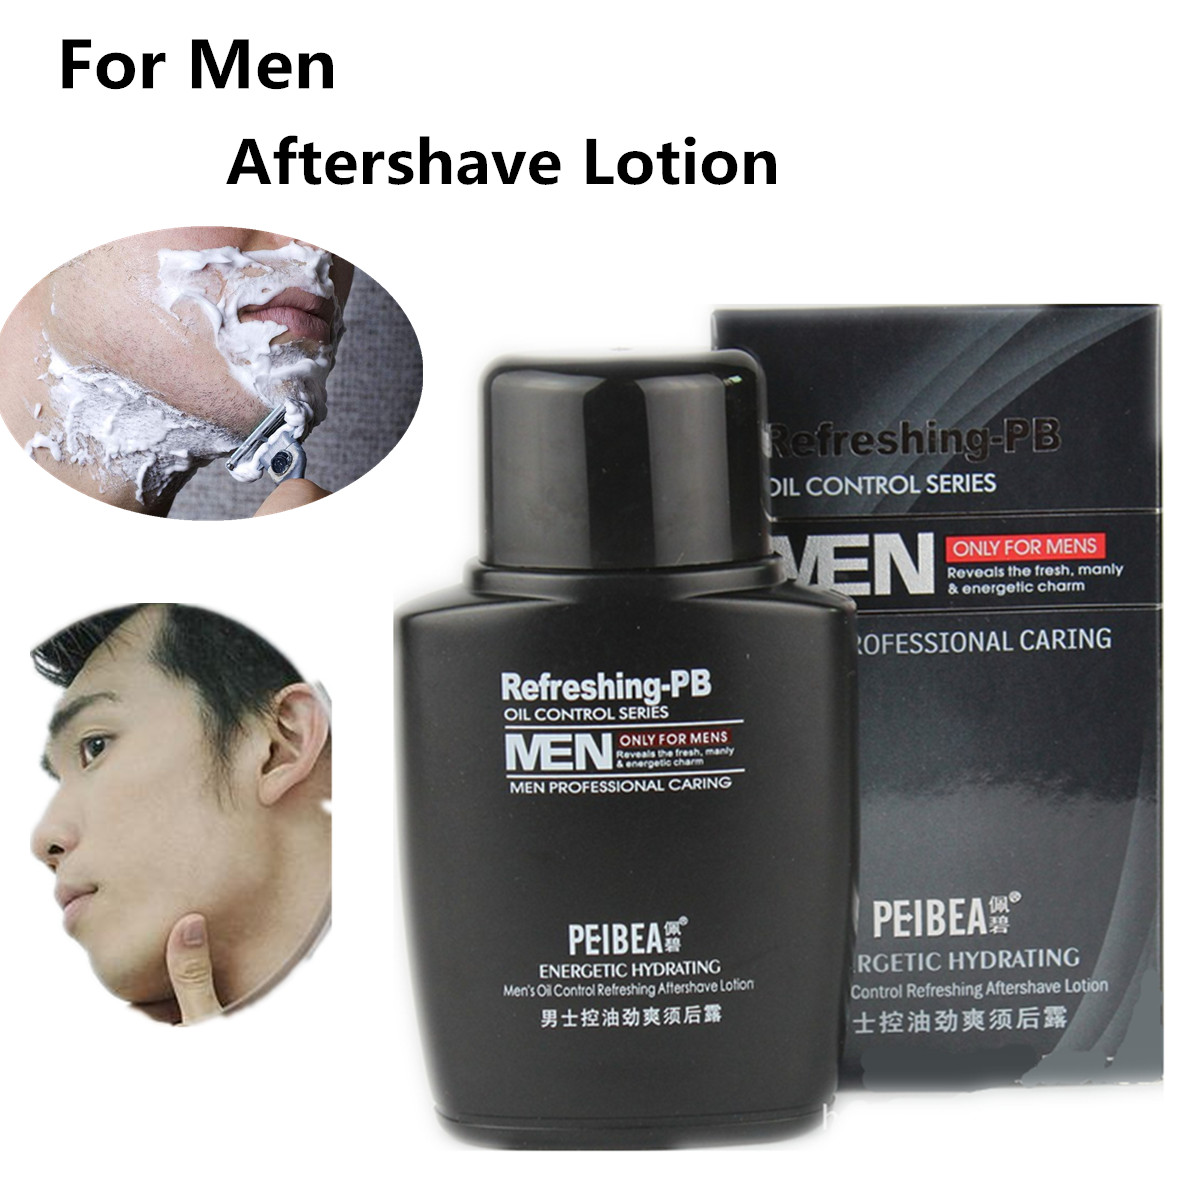 Pro-Beard-Shaving-Set-Beard-Cream-Aftershave-Lotion-Shampoo-Beard-Razor-amp-Brush